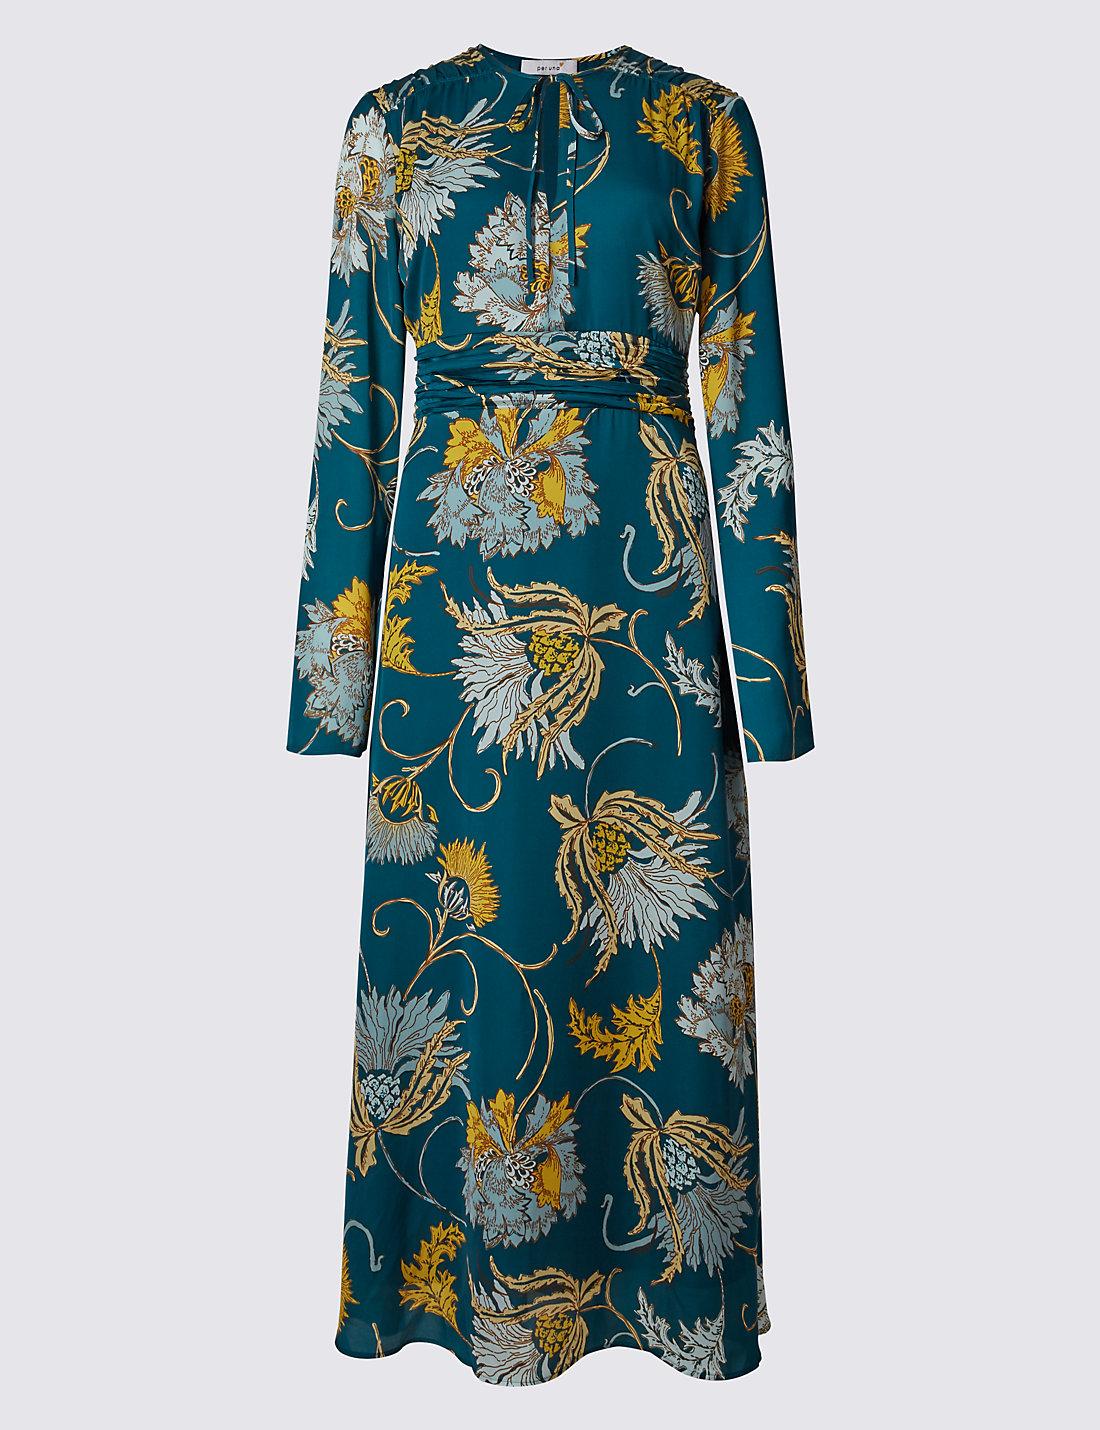 PER UNA New Fit & Flare Thistle Dress £55 Click to visit M&S